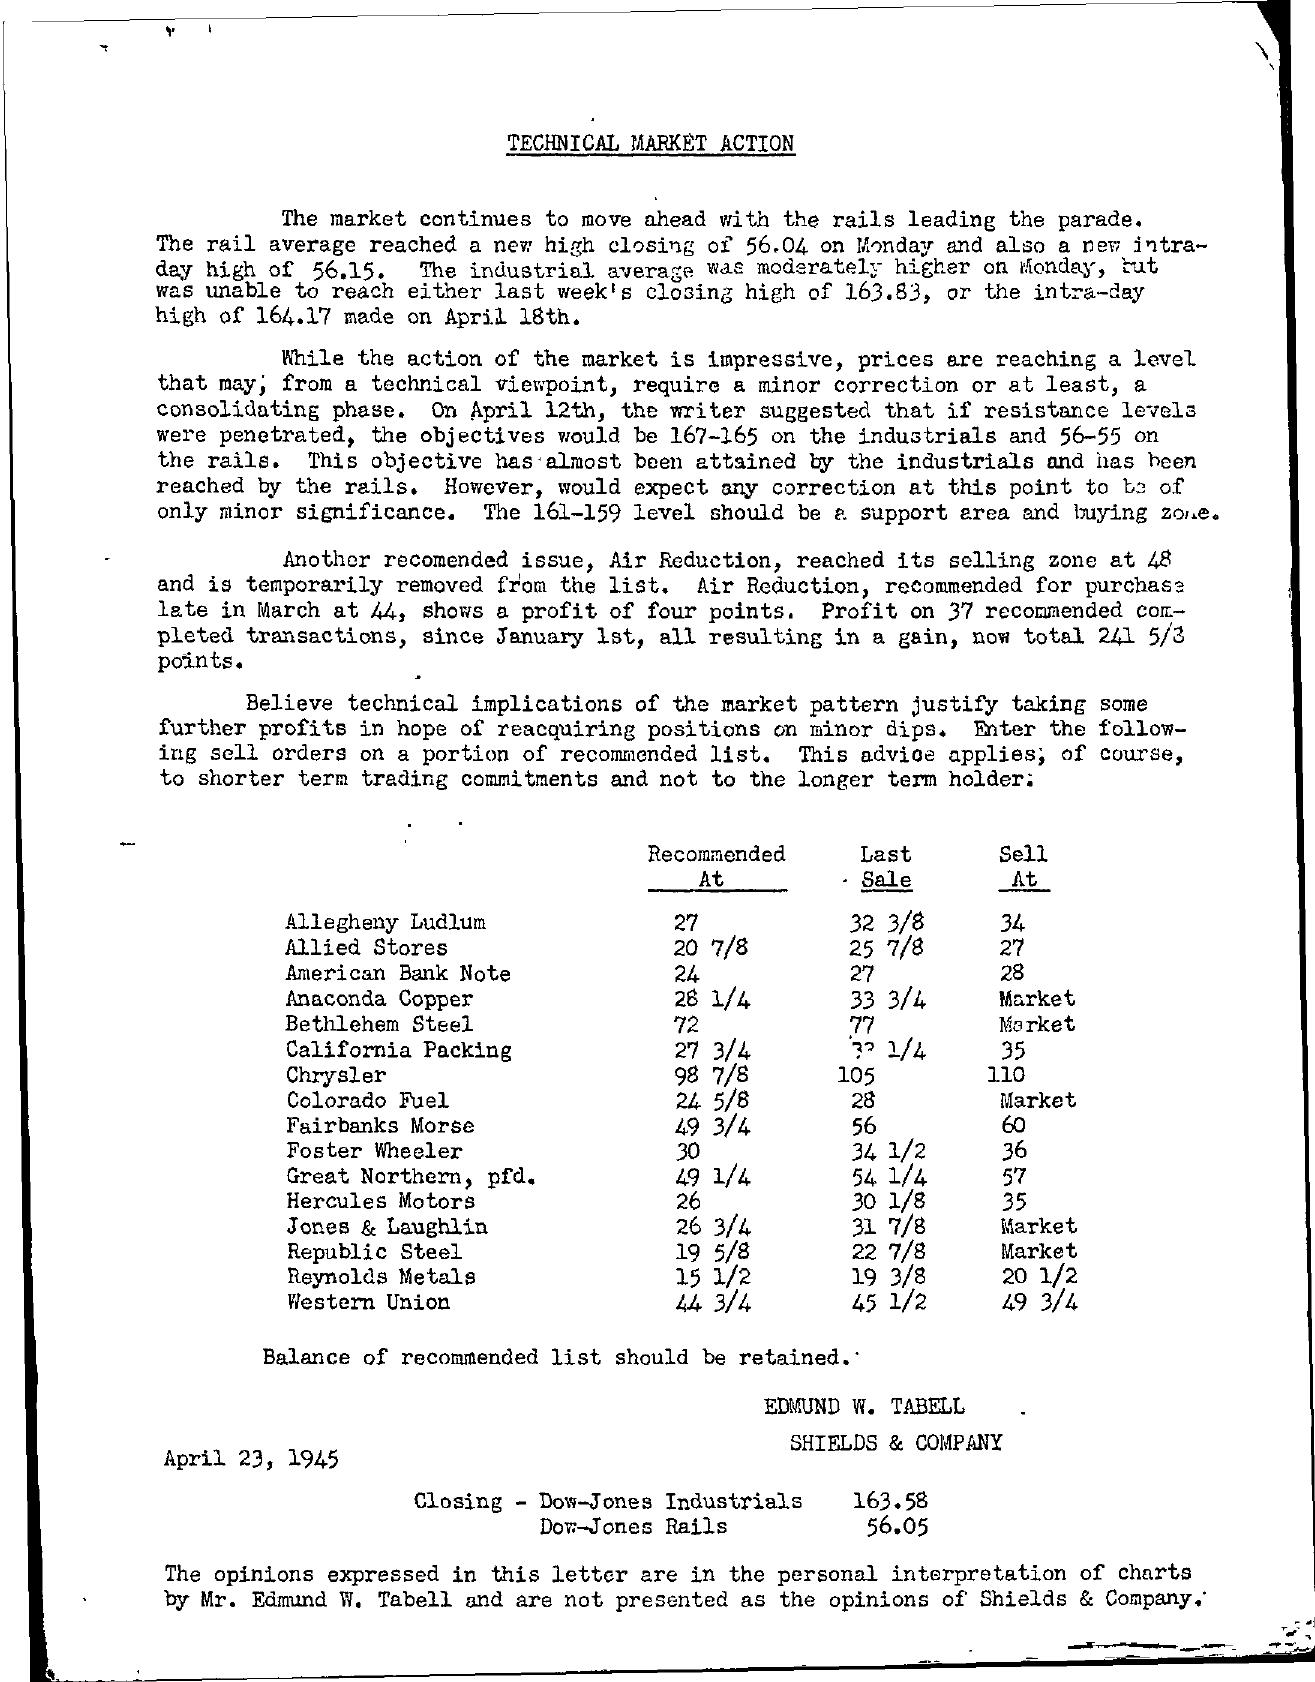 Tabell's Market Letter - April 23, 1945